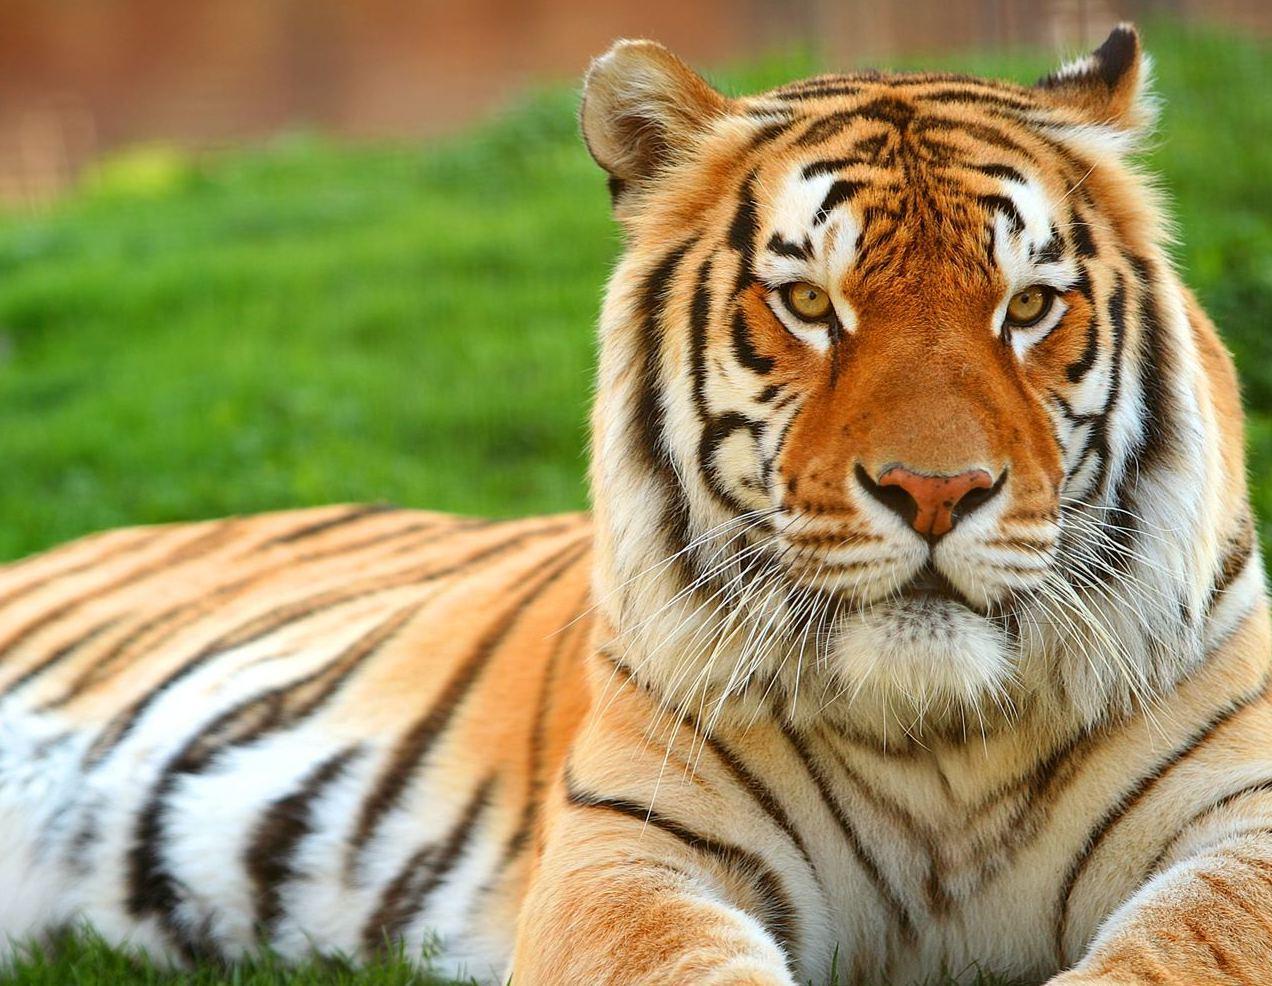 Tiger Hd Wallpaper Widescreen 54 Wallpapers - Tiger Lion Photo Download , HD Wallpaper & Backgrounds